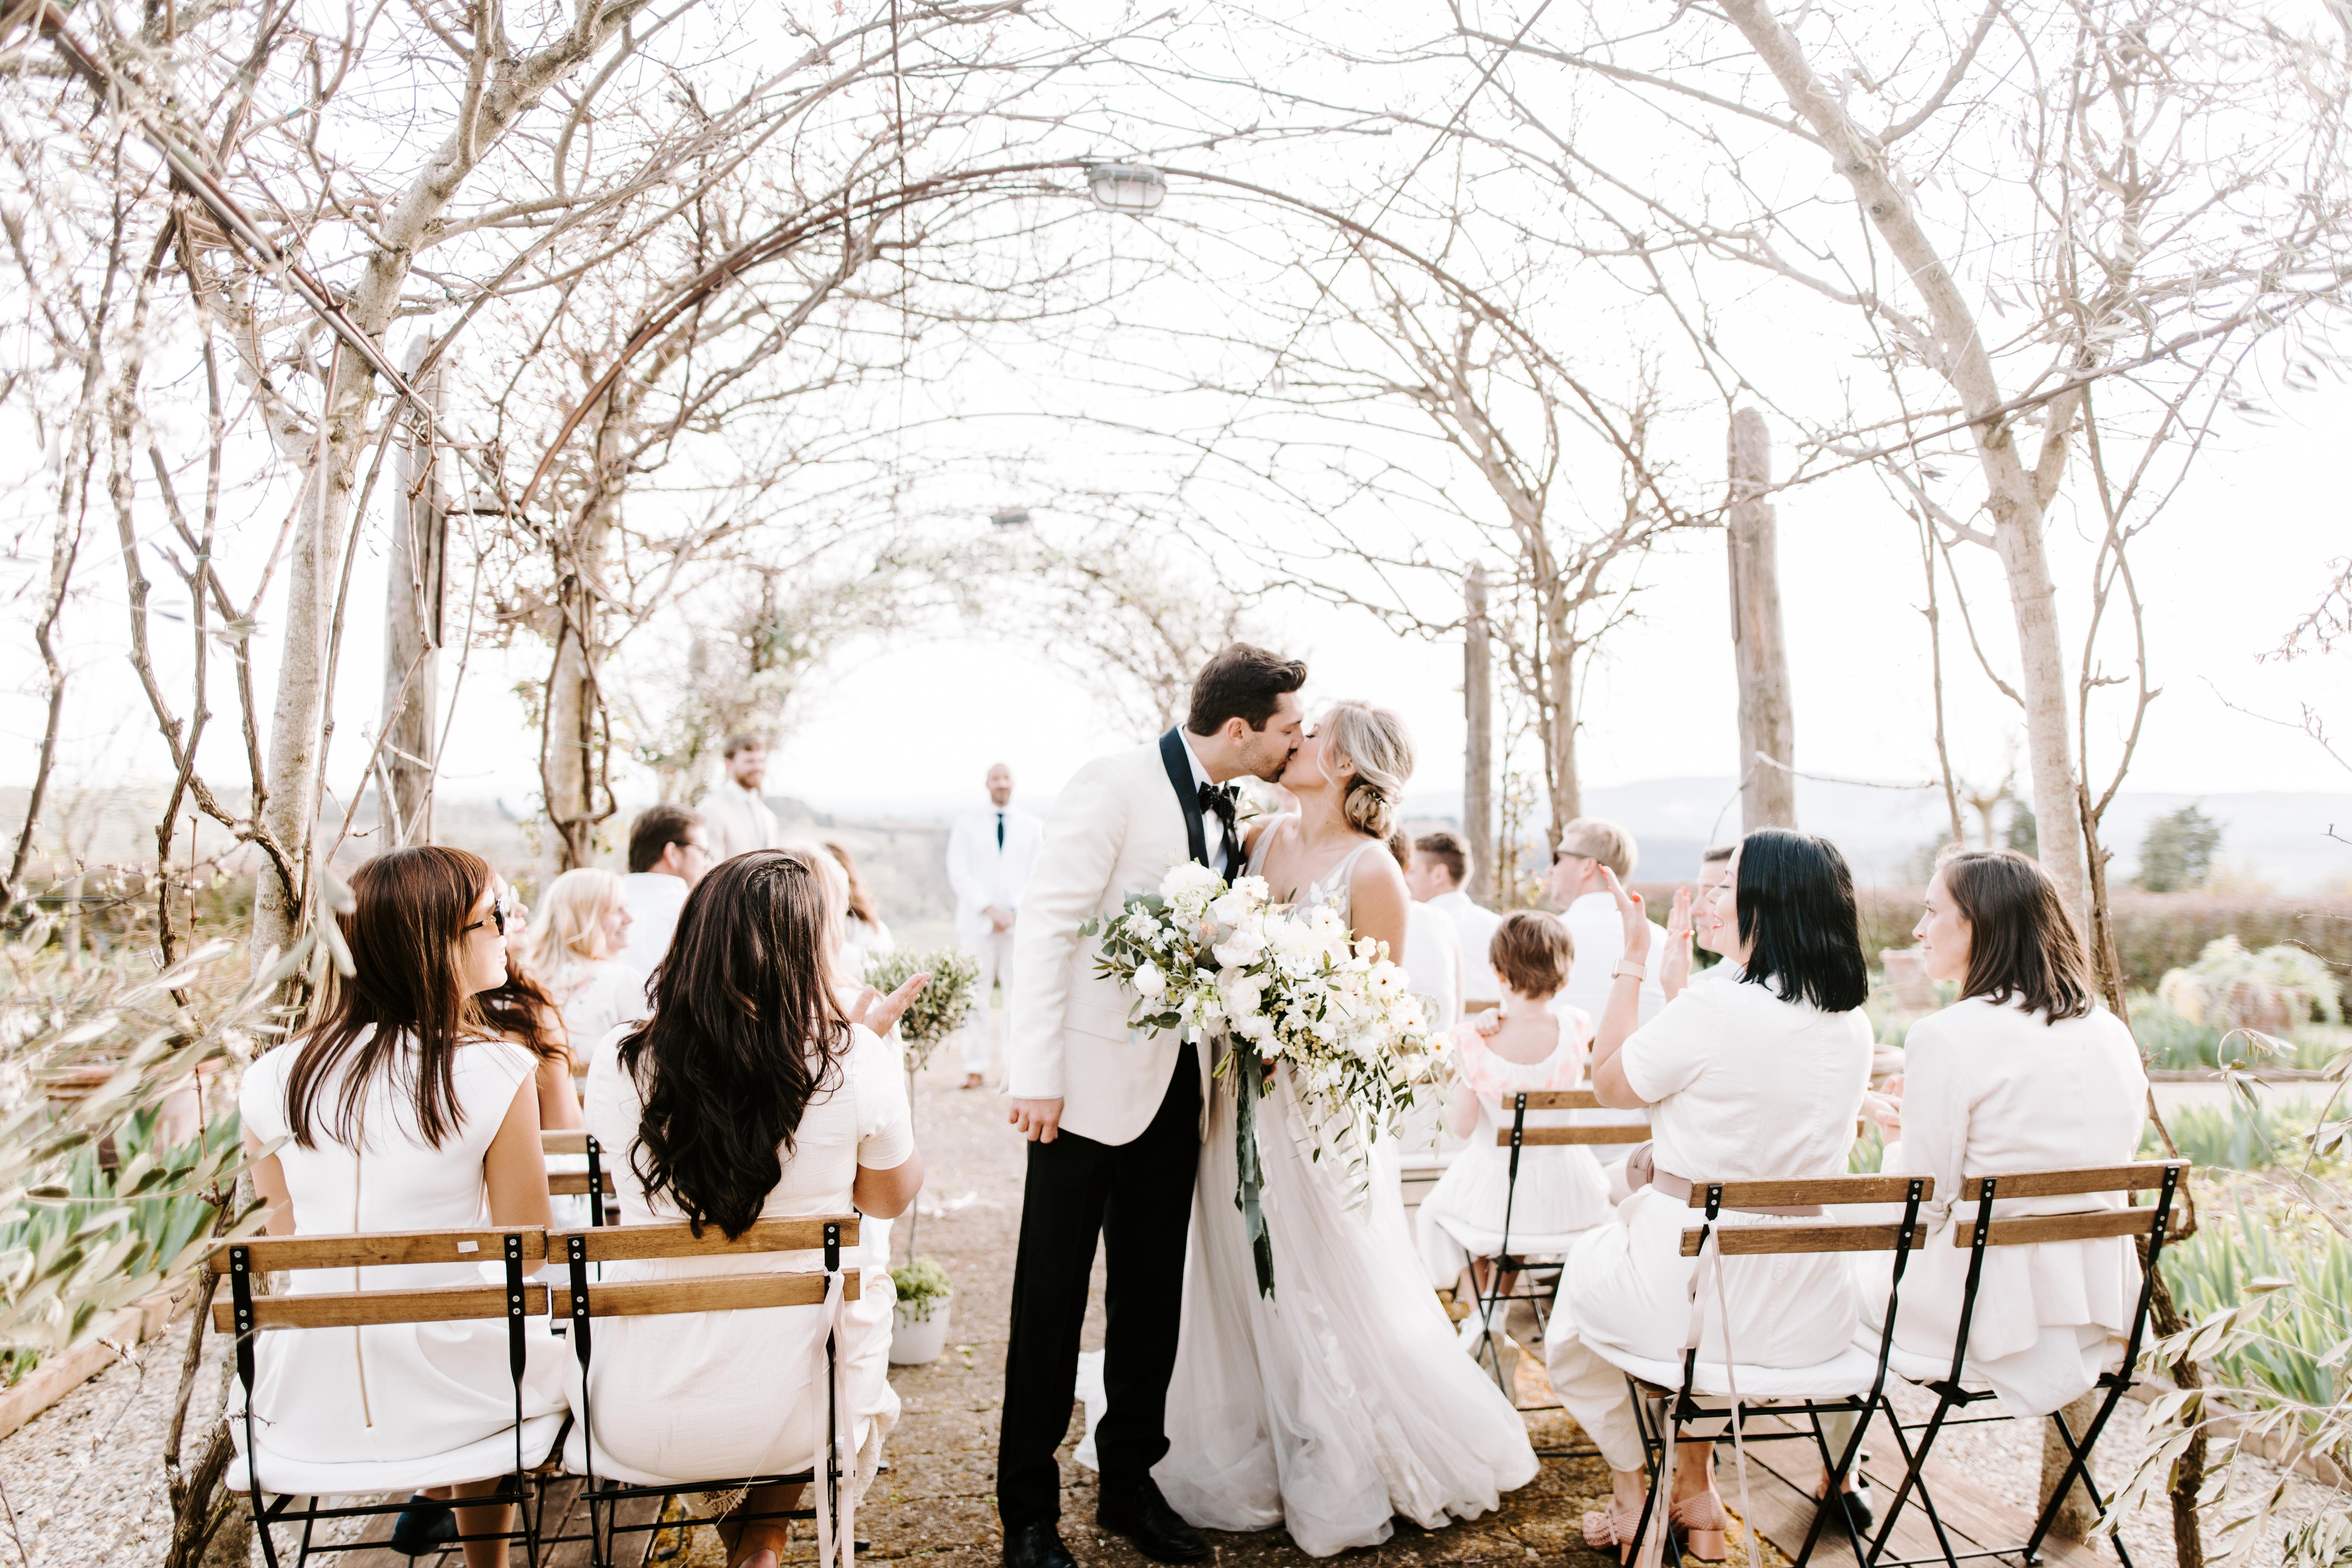 Sam Areman Photo - Italy - Borgo Petrognano Wedding 145171_